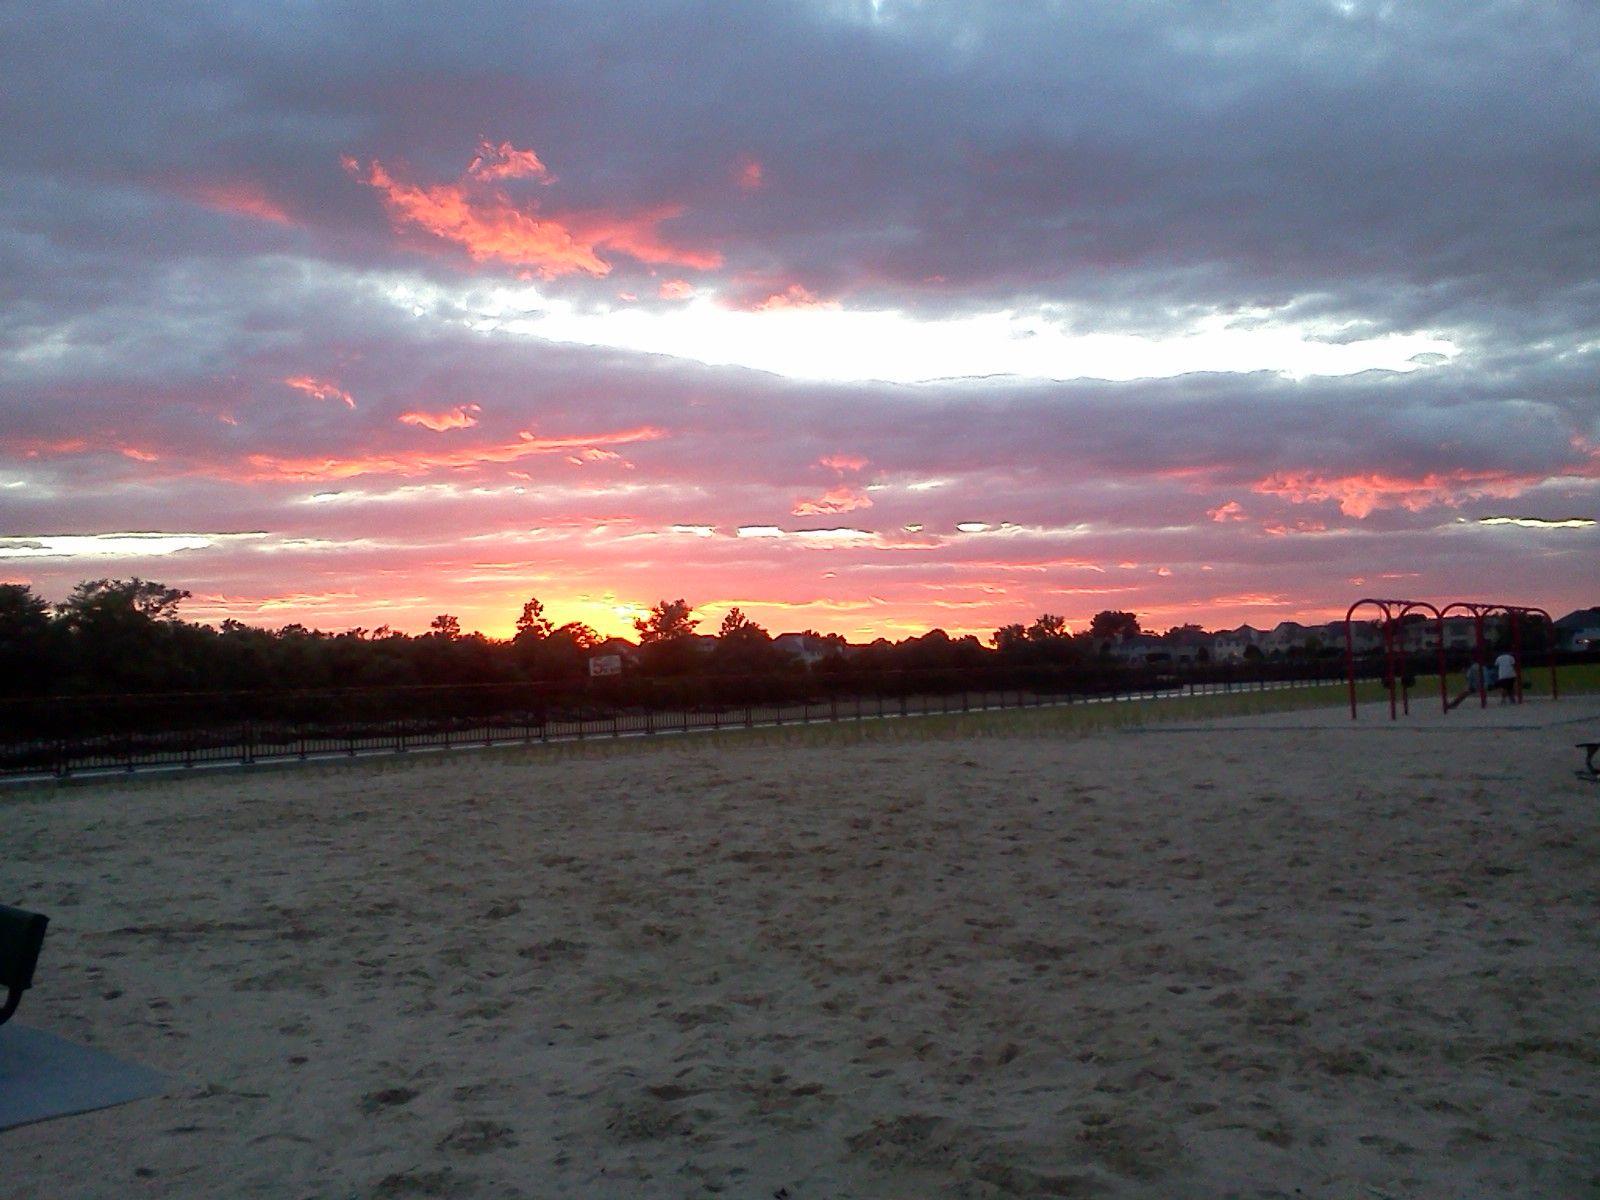 Florence Ave Beach Massapequa Ny Sunset 6 26 12 Scenery Sunset Beach